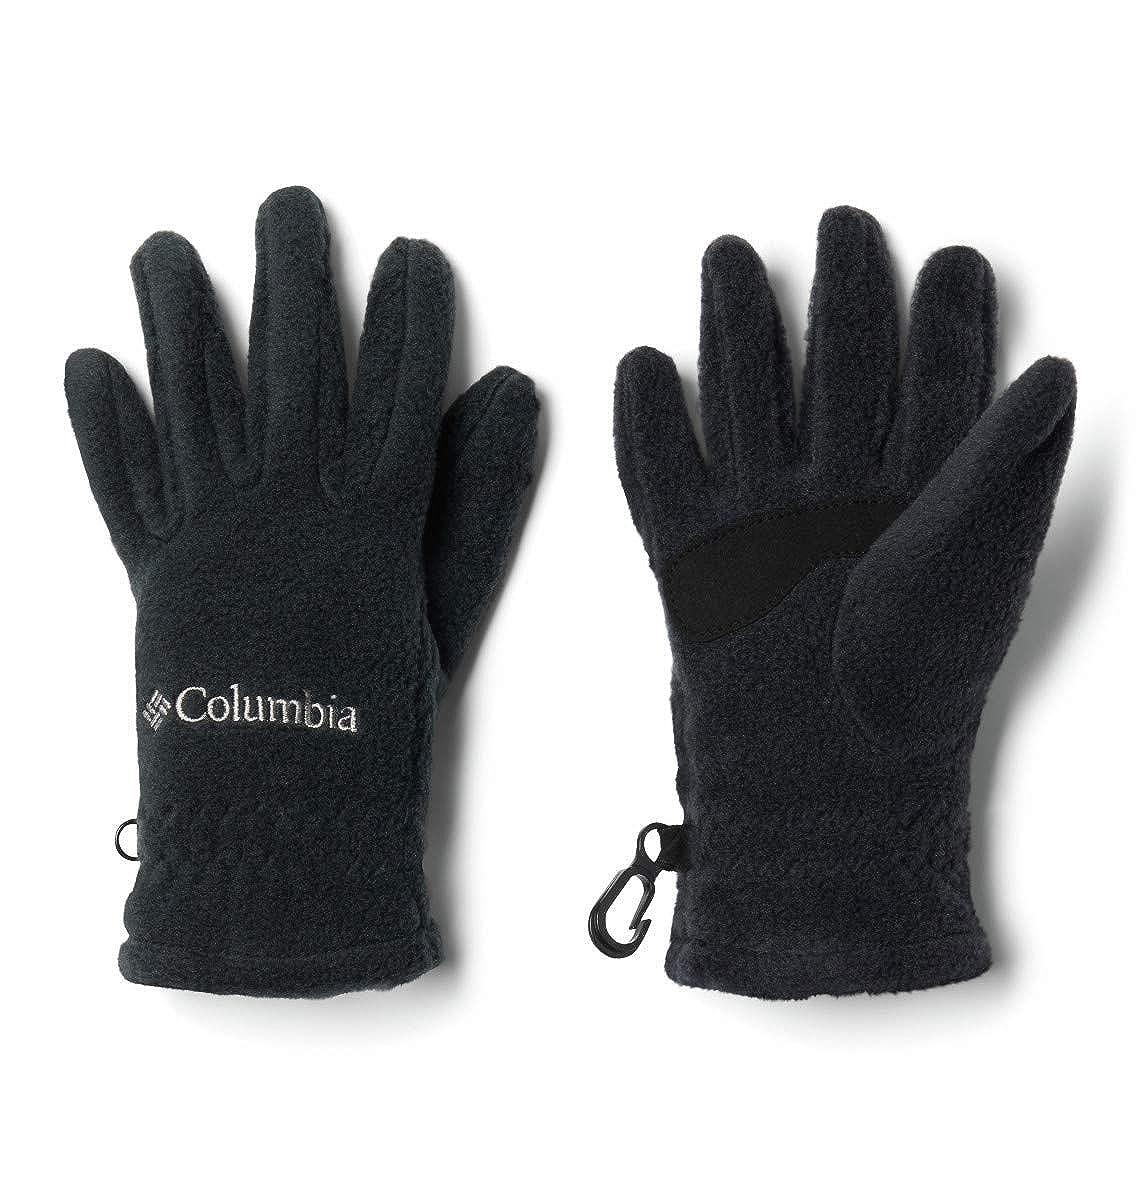 Columbia boys Youth Fast Trek Glove Gloves